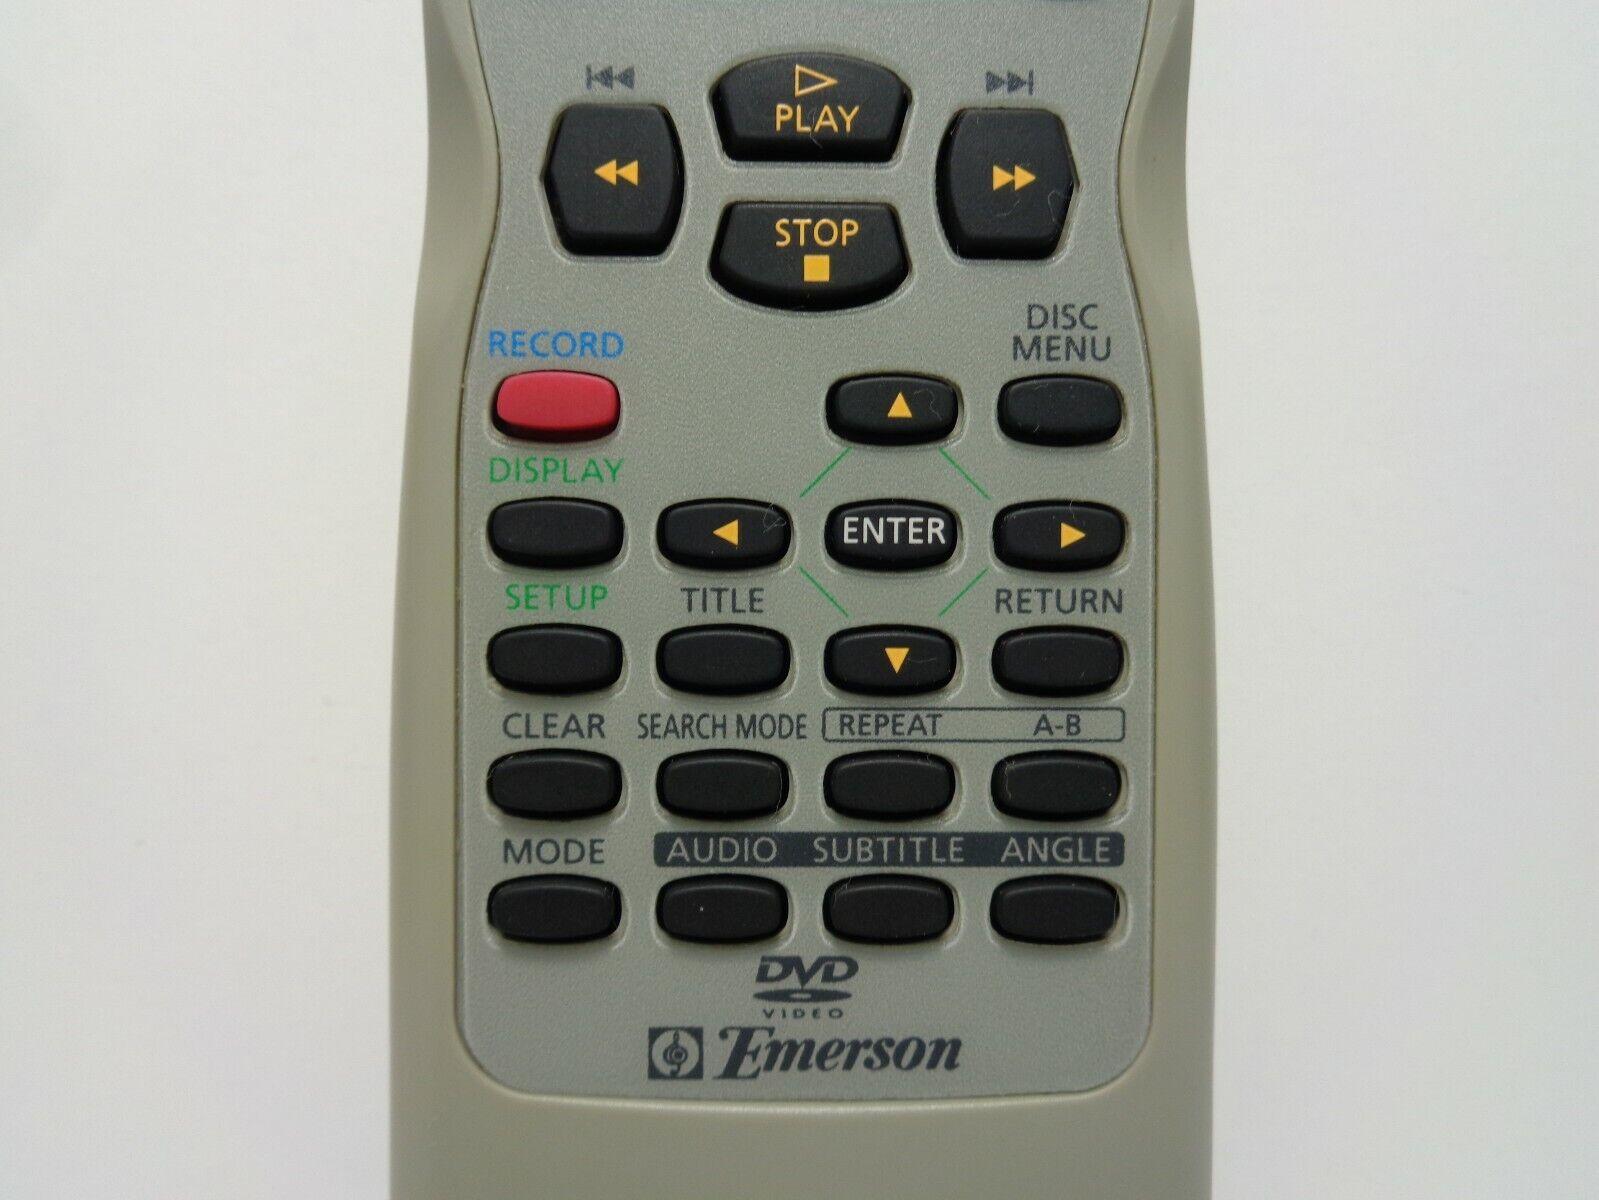 Emerson NE223UD Factory Original Tv/dvd/vcr Combo Remote Ewc19t4 Cetd204